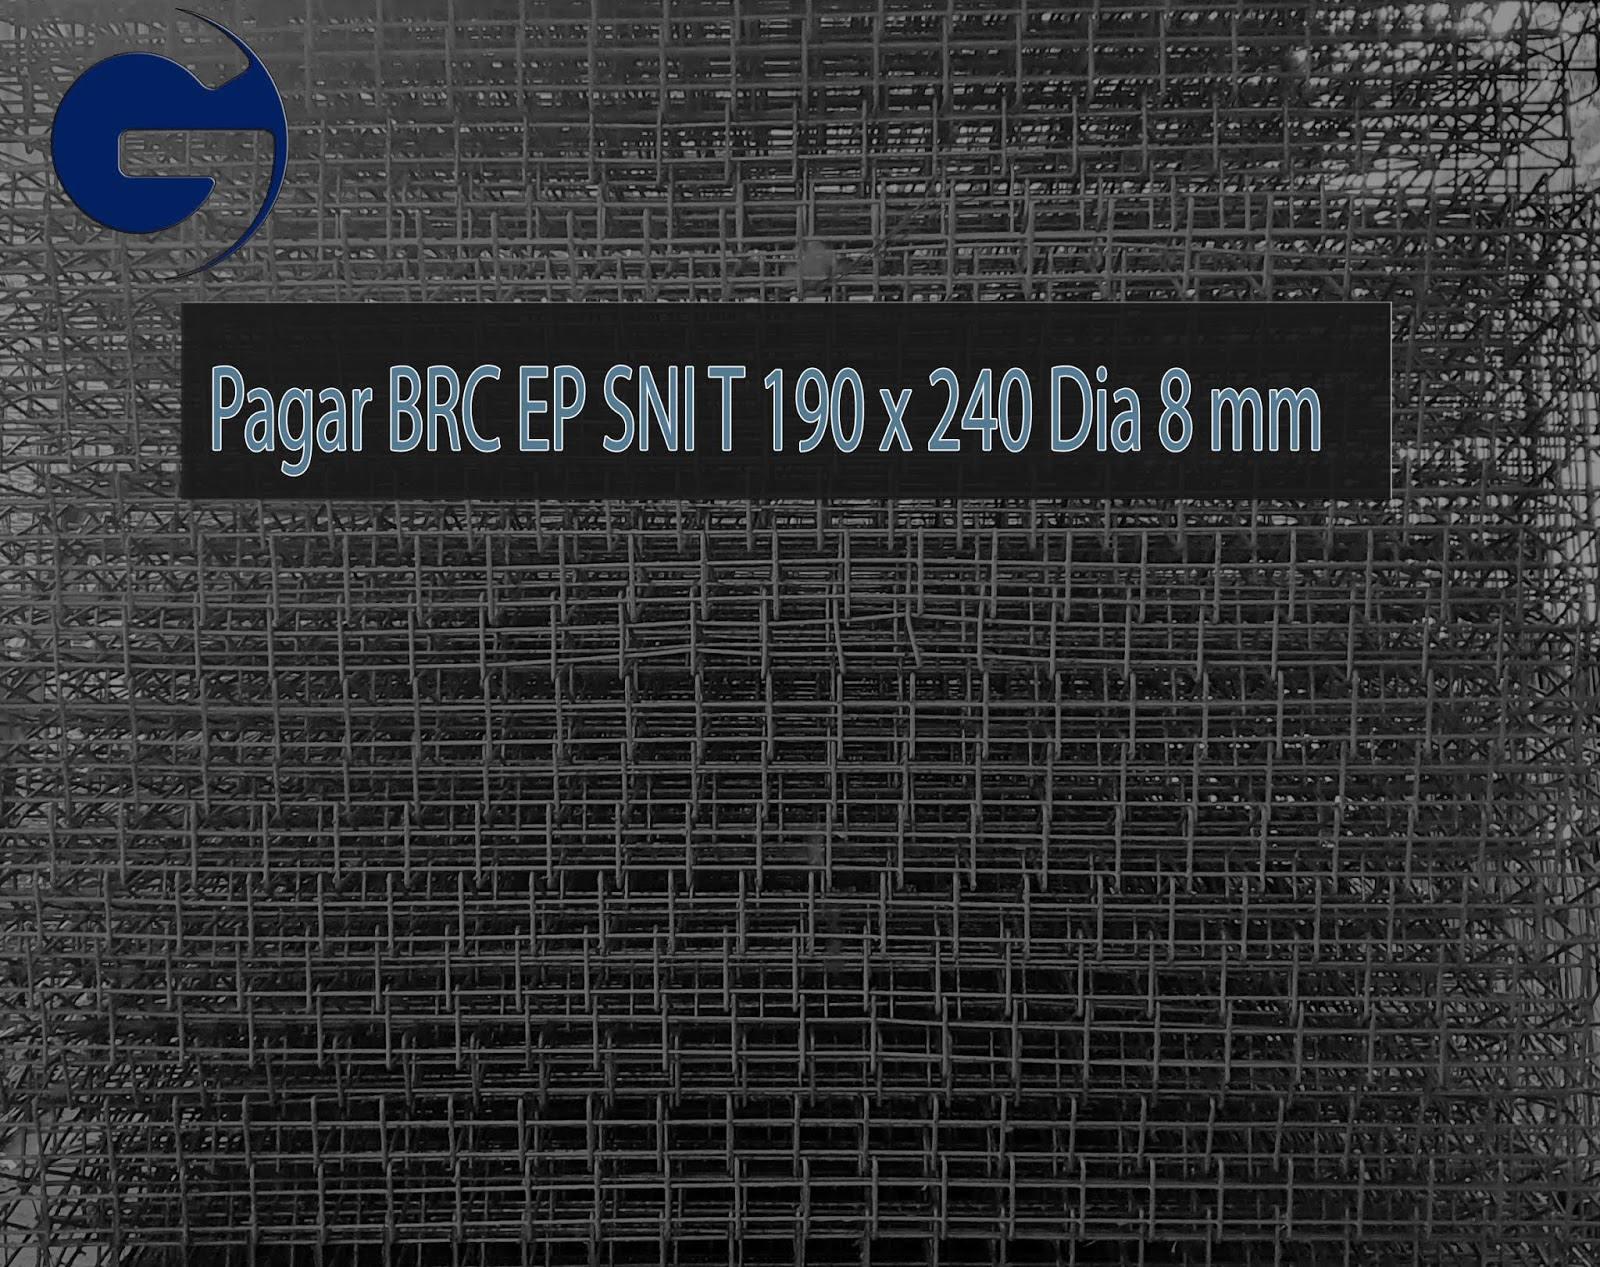 Jual Pagar BRC EP SNI T 190 x 240 Dia 8 mm